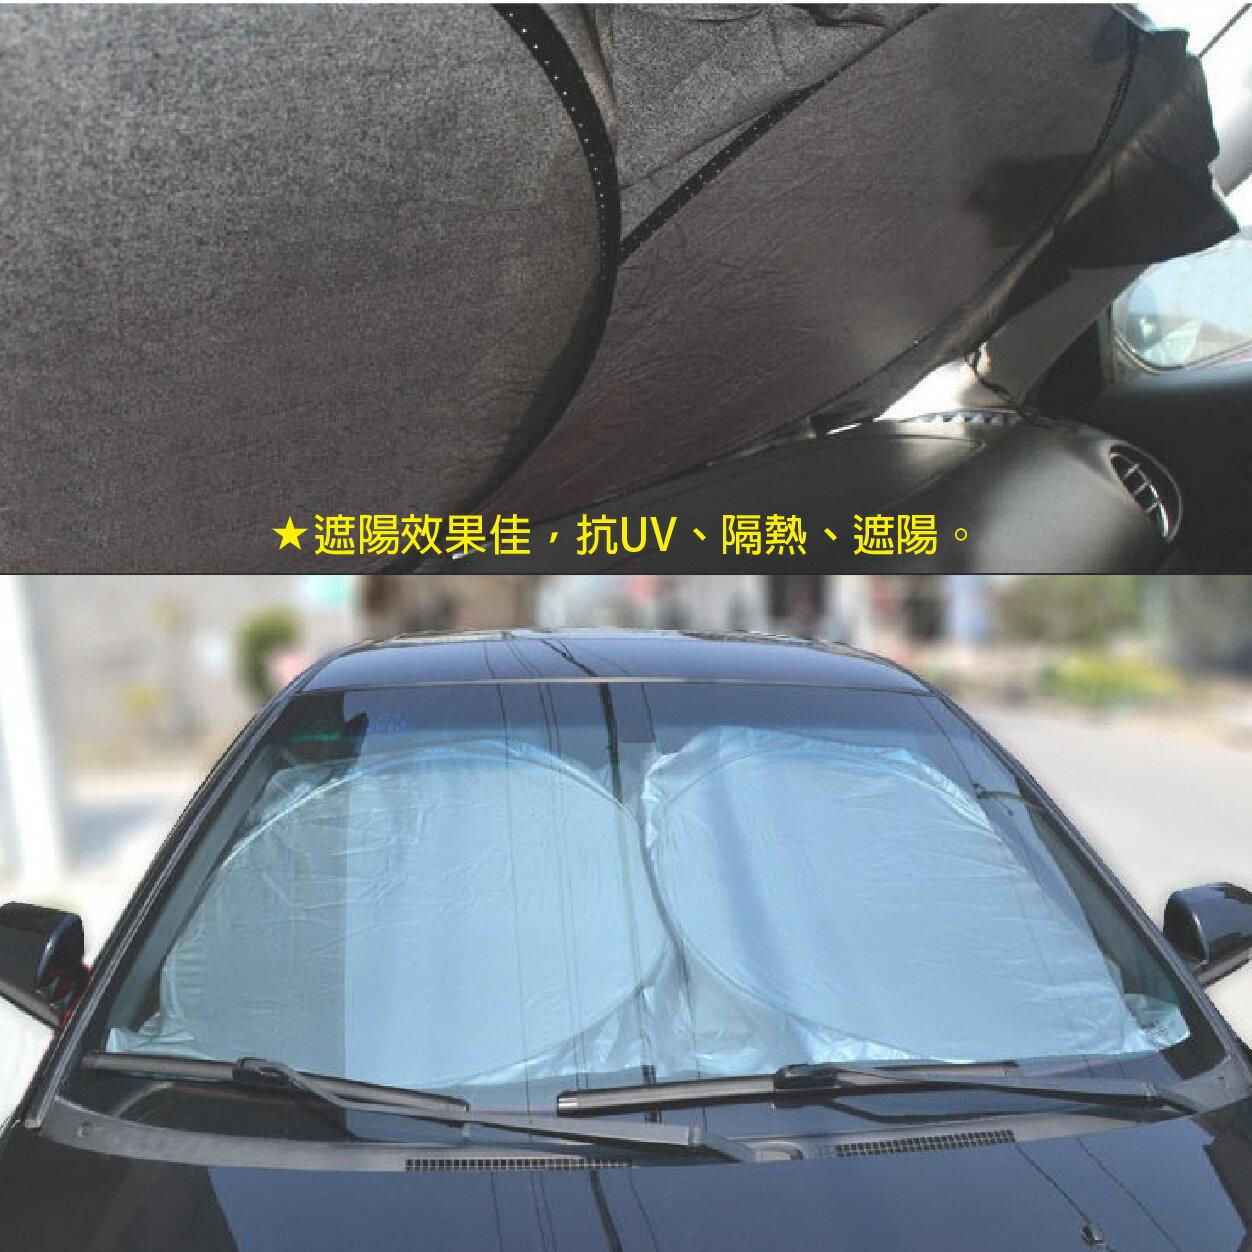 e系列汽車用品【前檔遮陽大圓遮】雙層 抗UV 隔熱 前檔玻璃 遮陽 擋光